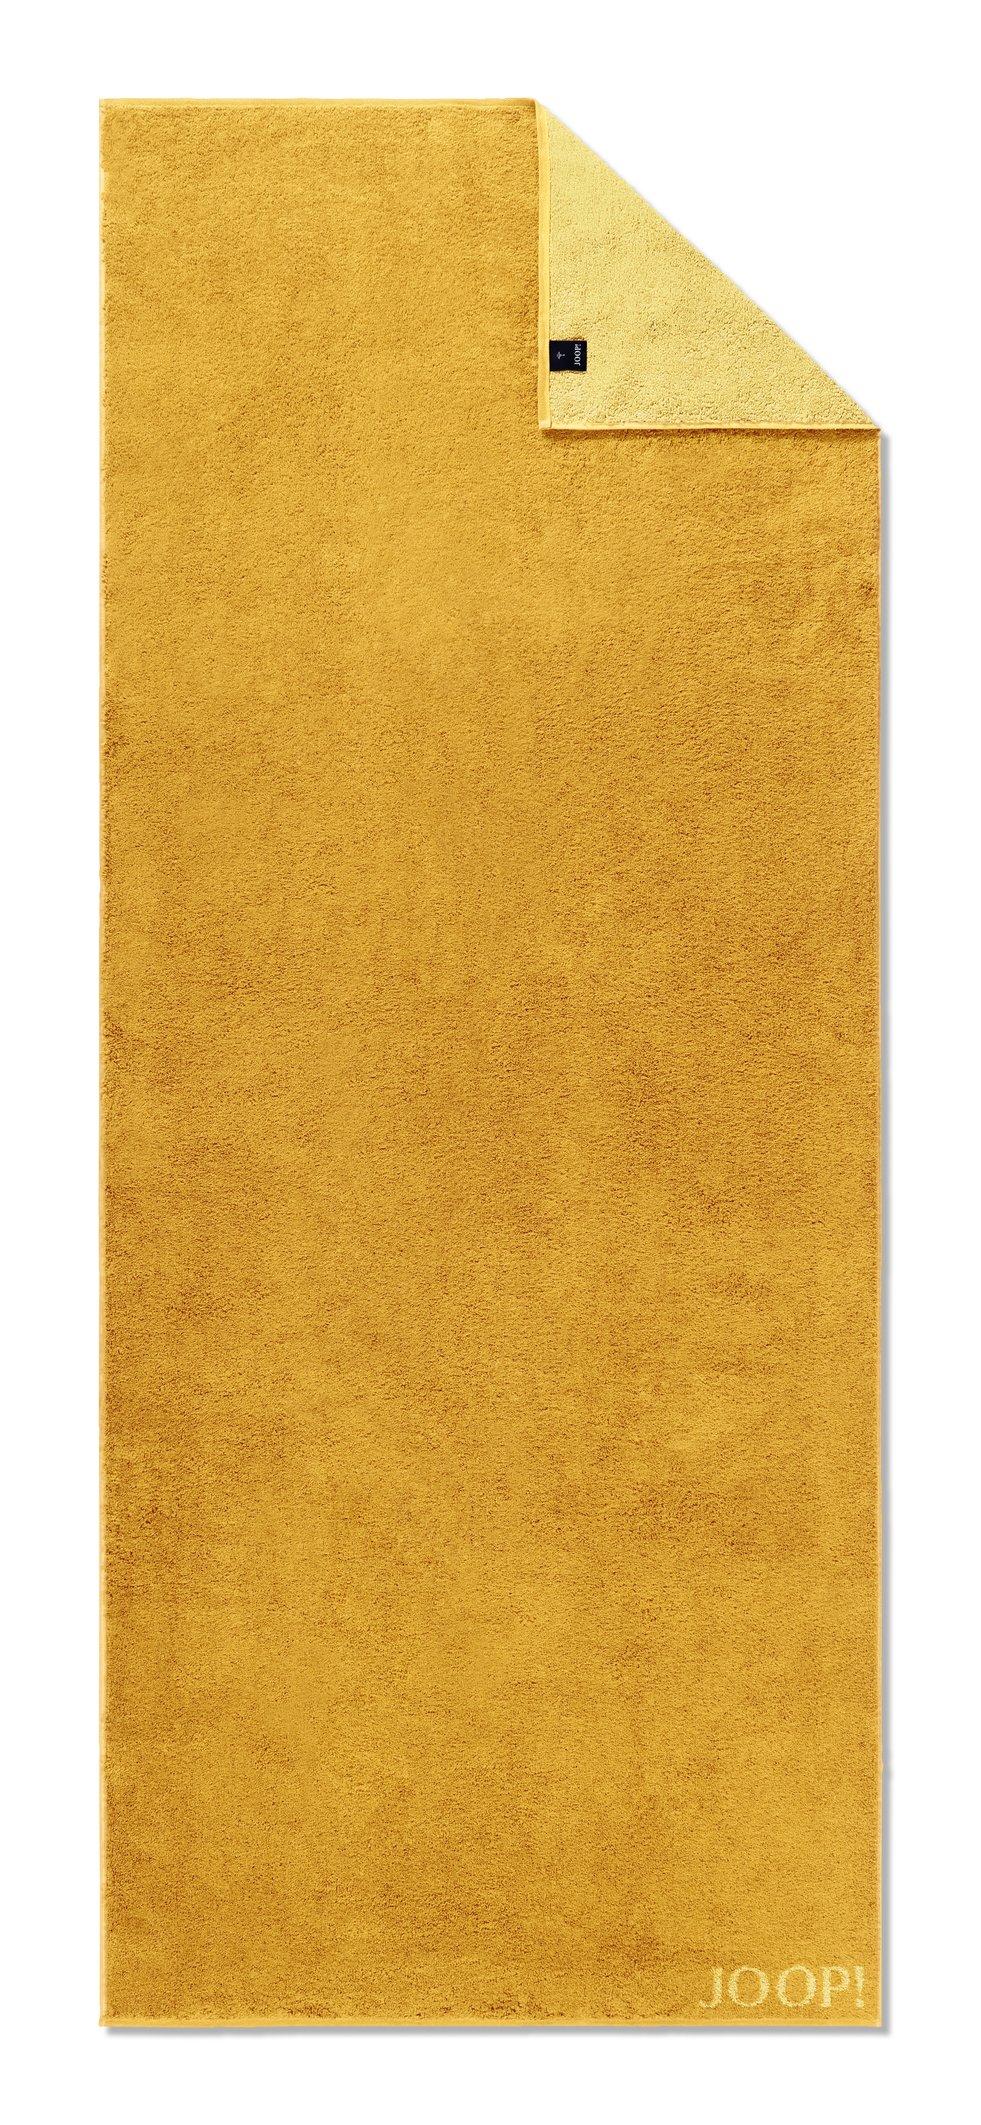 JOOP! Classic Doubleface Saunatuch 80x200 cm 1600-50 Honig Kollektion 2020